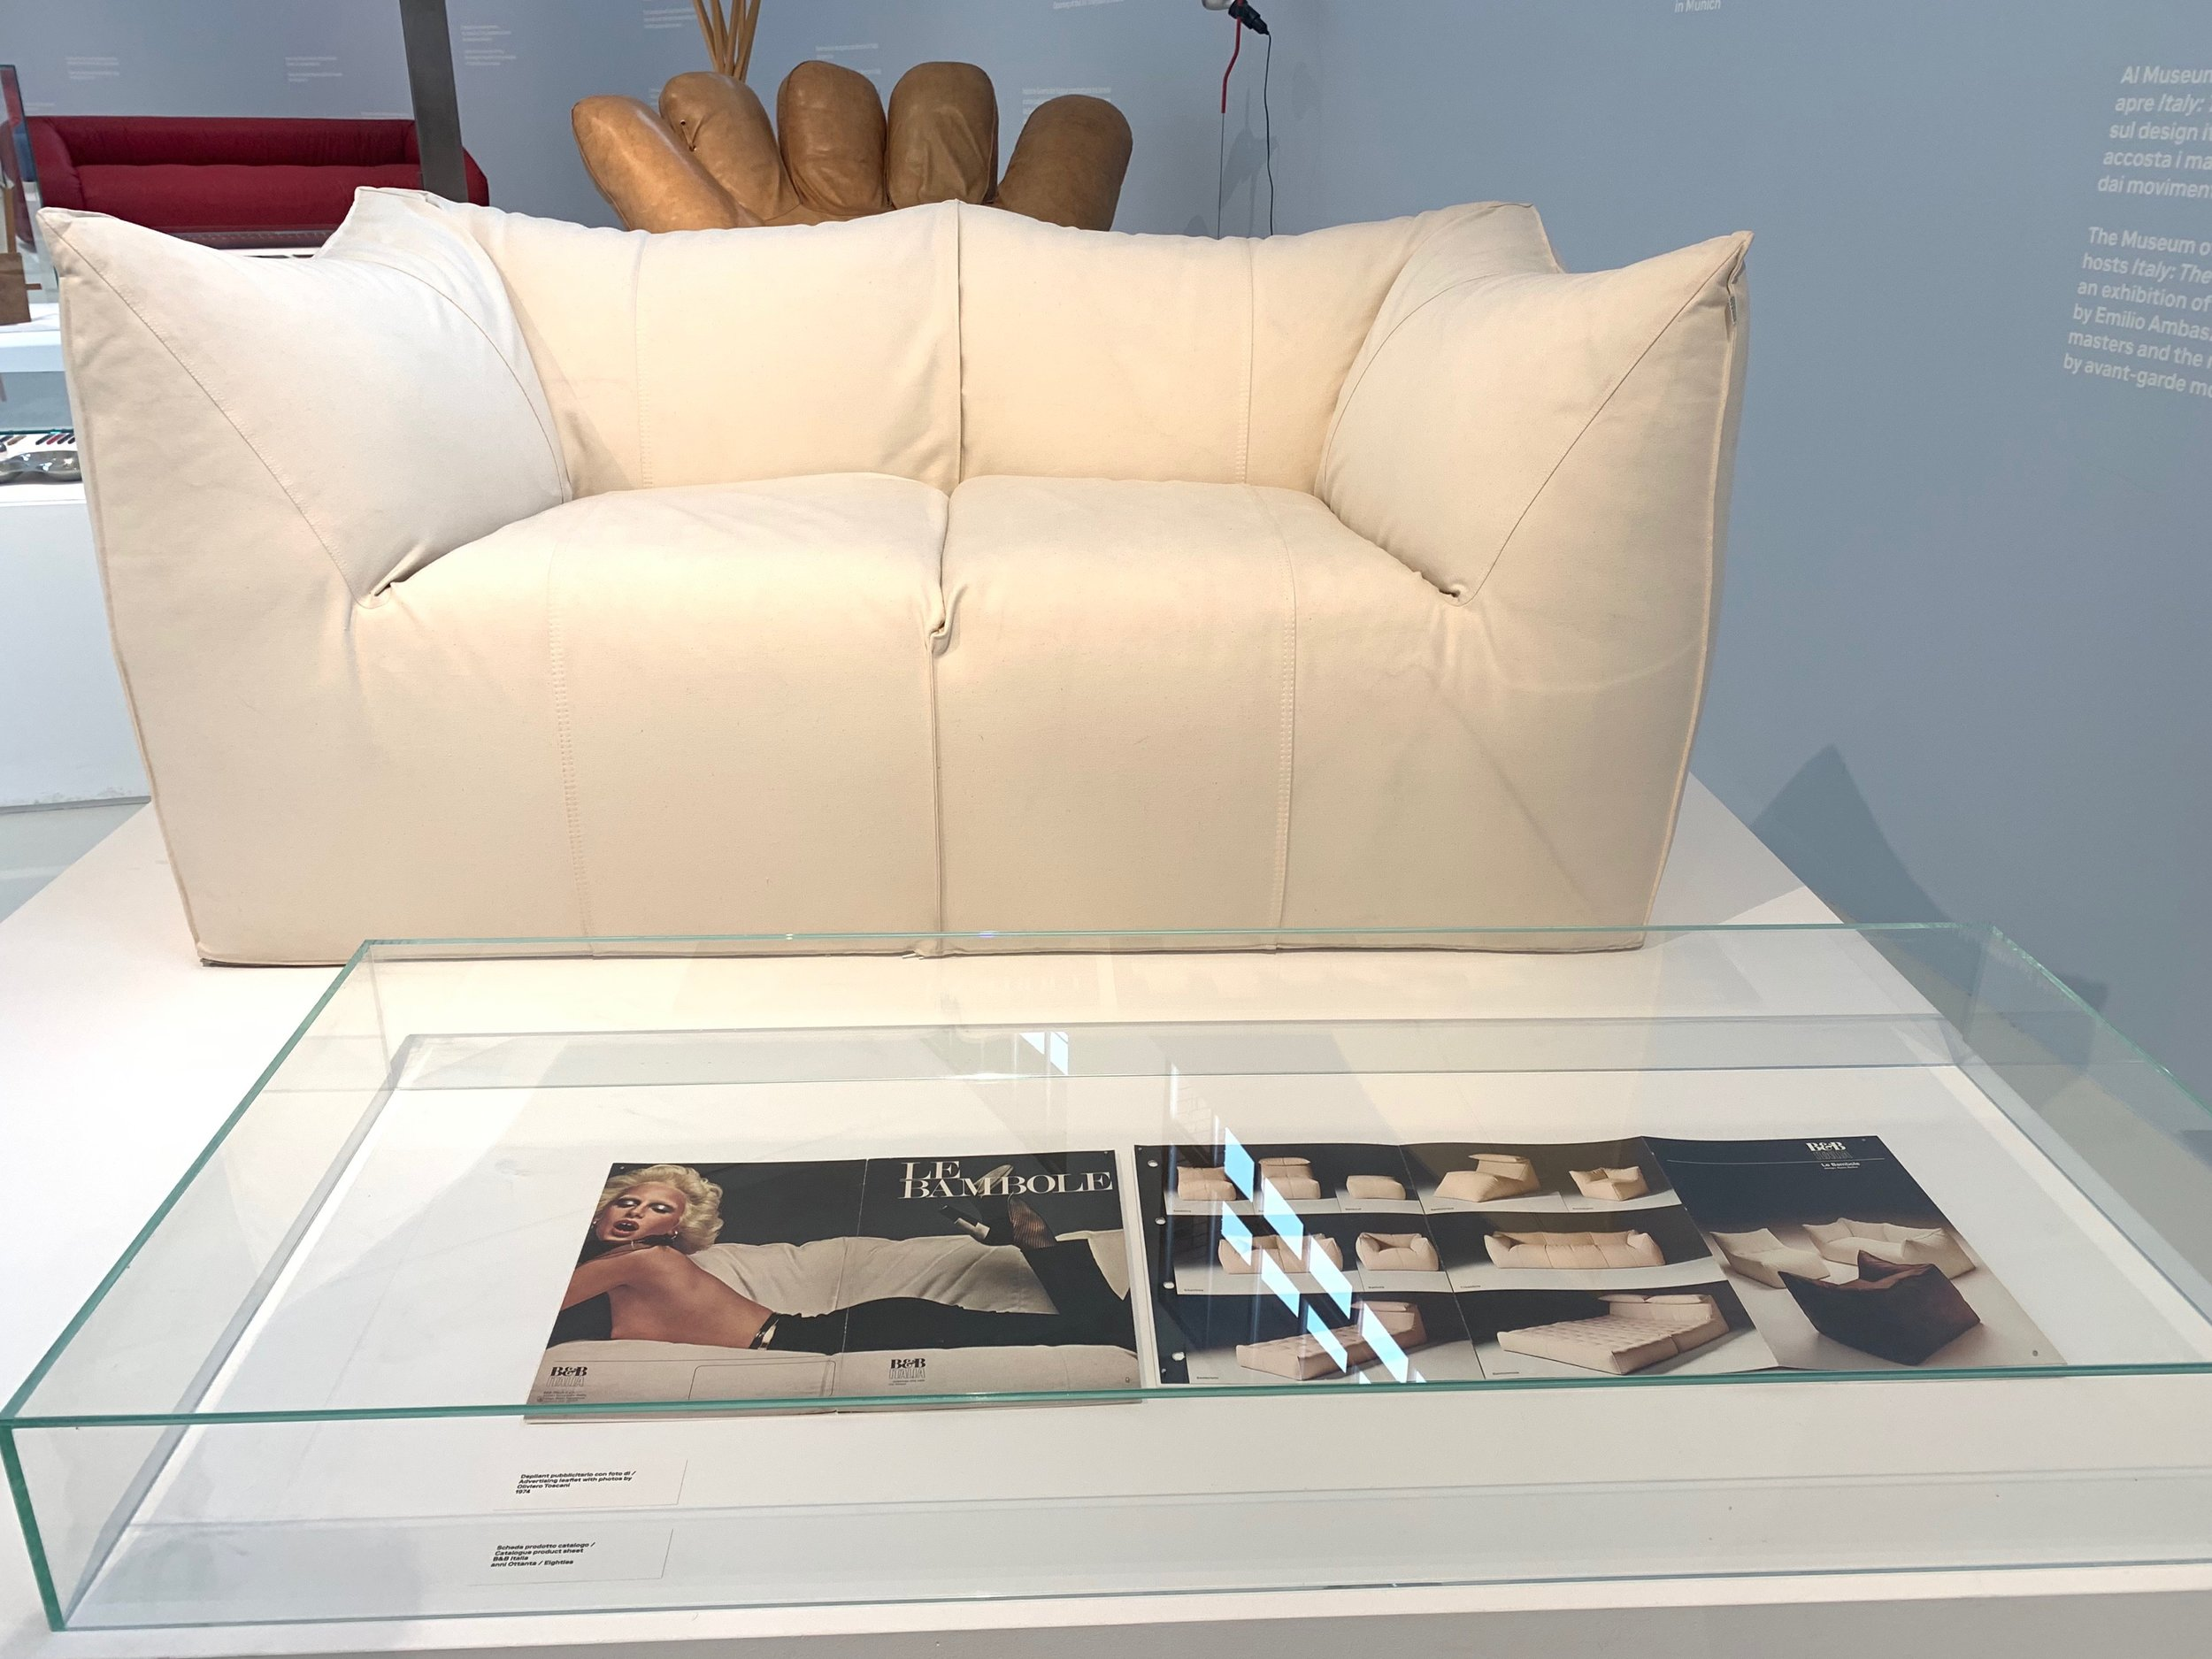 Museum Of Italian Design - Italian Mid Century Modern Furniture Designitalia00031.jpeg